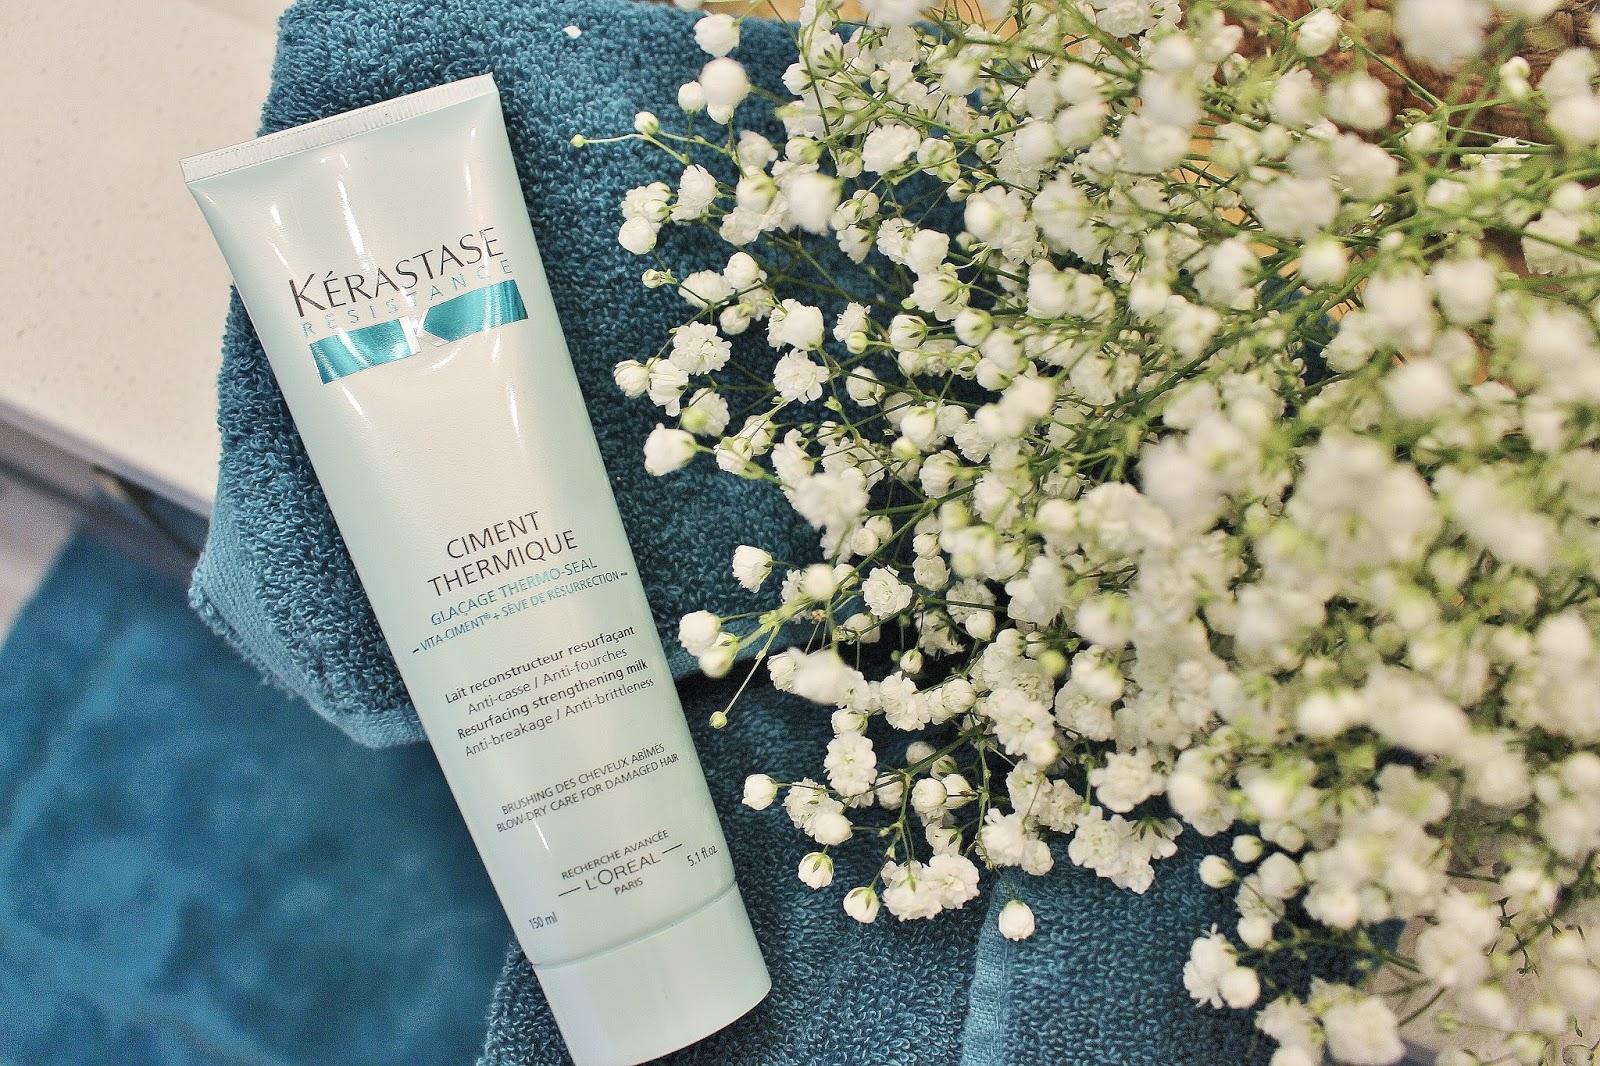 Bijuleni - Kerastase Ciment Thermique Hair Care